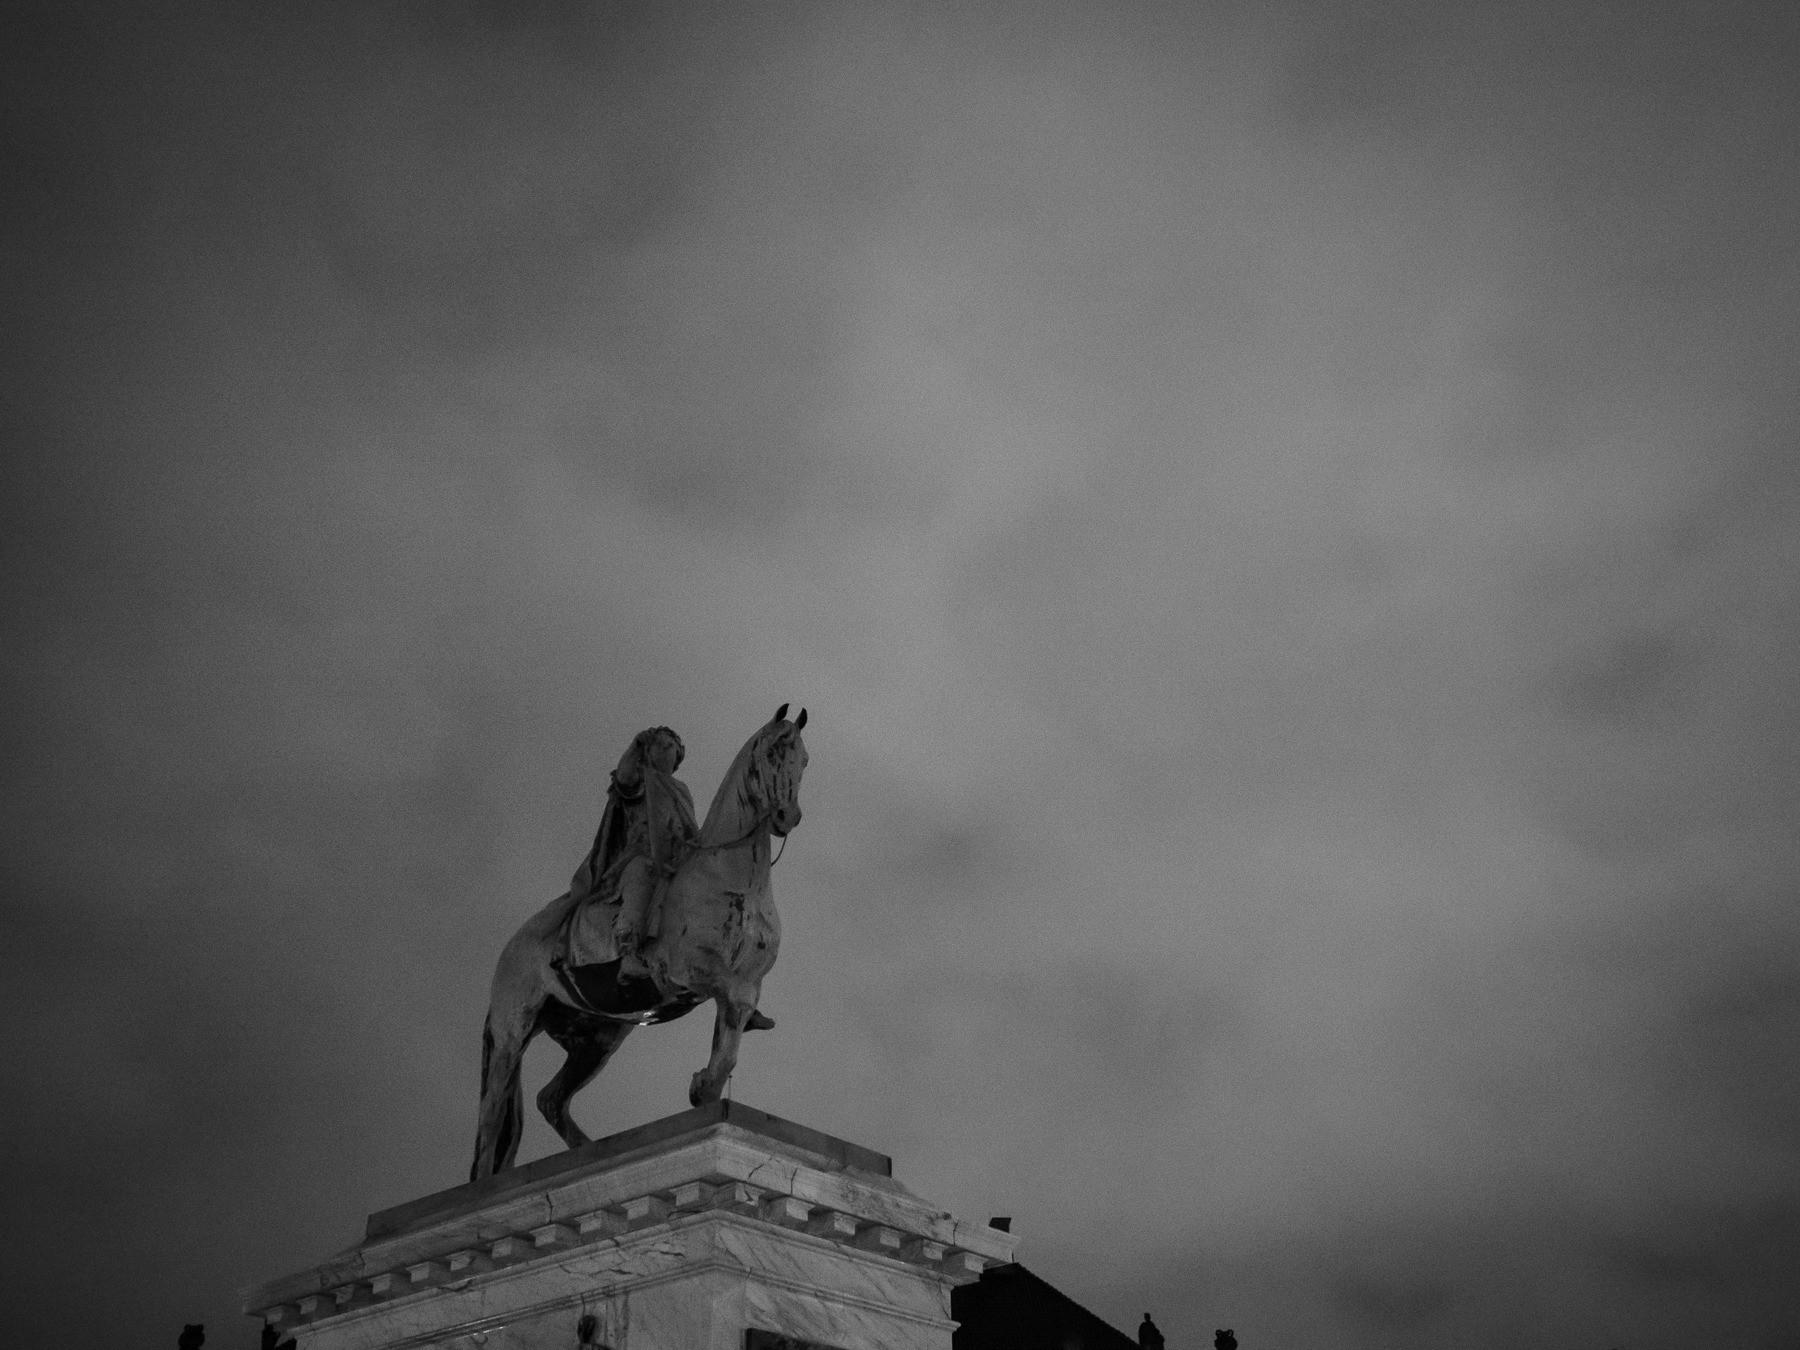 rytterstatuen på amalienborg slotsplads - Frederik d. 5.